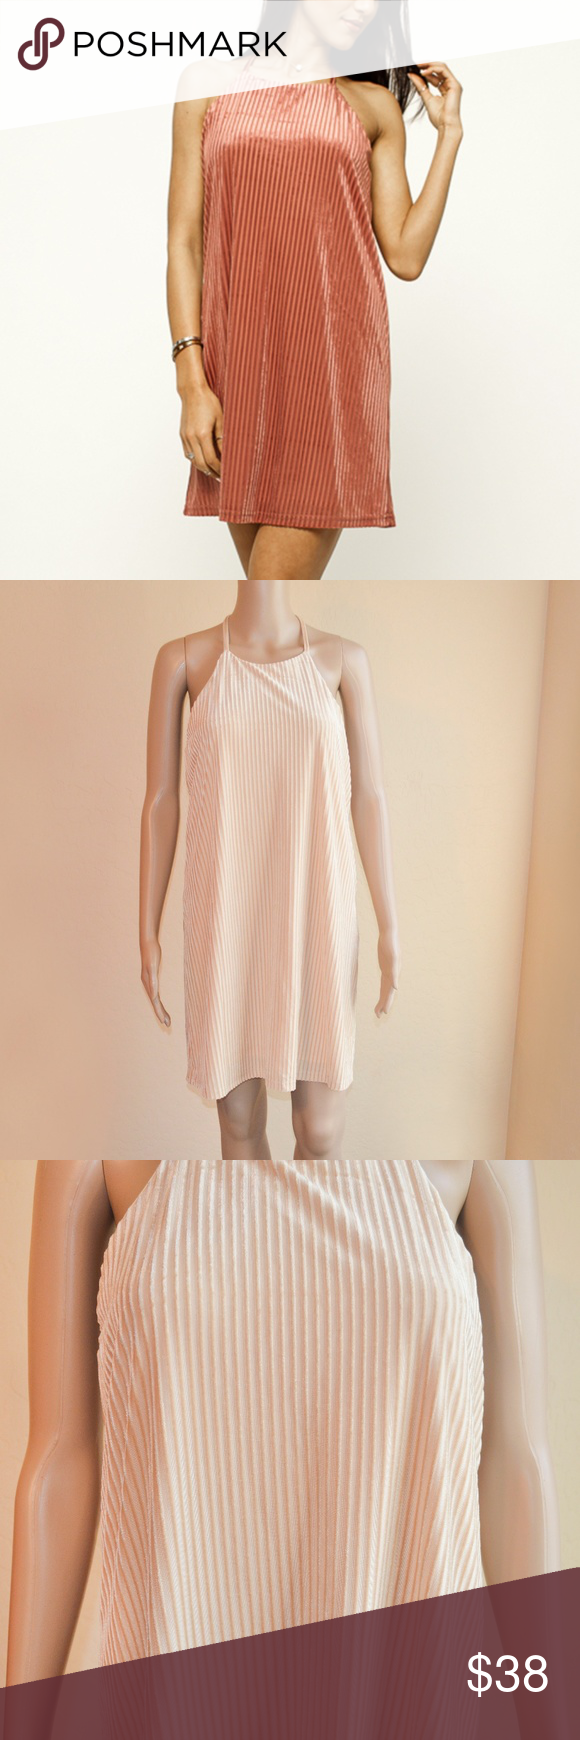 2241f6bdaf19 Very J BIA Beige Stripe Velvet Strappy Swing Dress Strappy swing dress.  Velvet fabric.